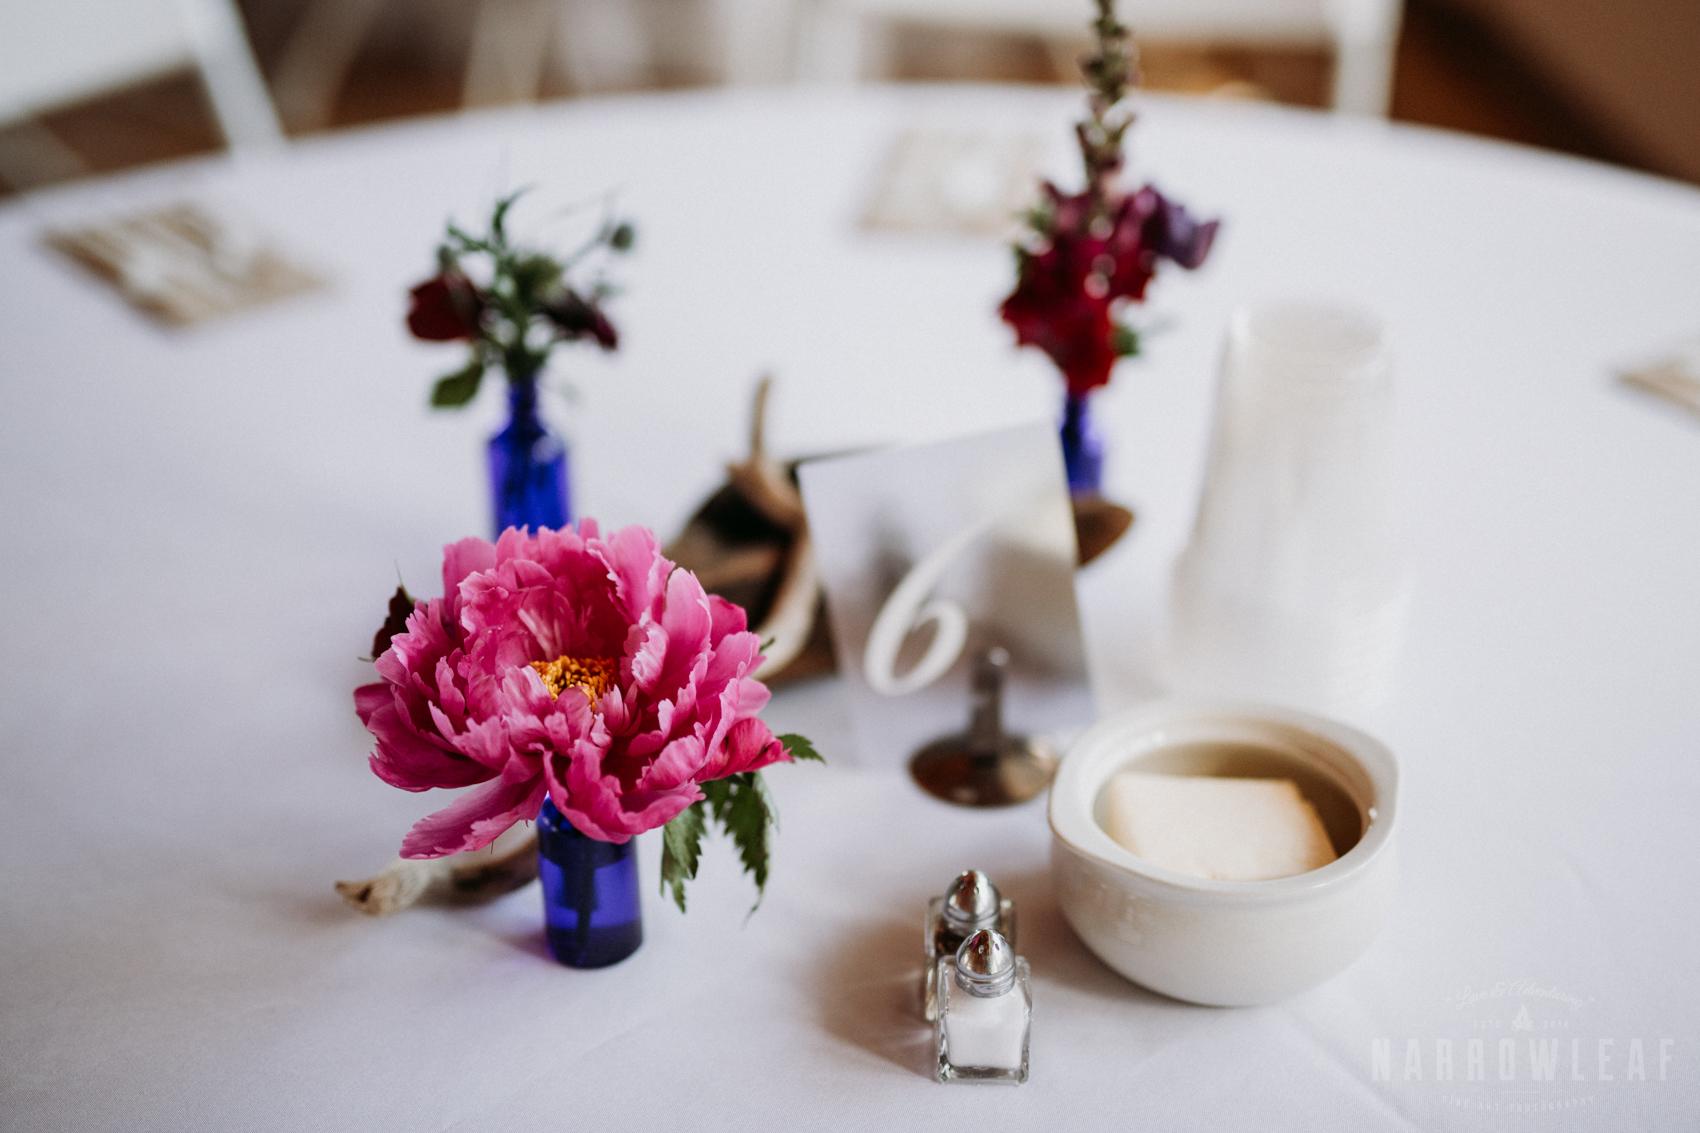 lakeside-wedding-reception-driftwood-blue-jar-decor-25.jpg